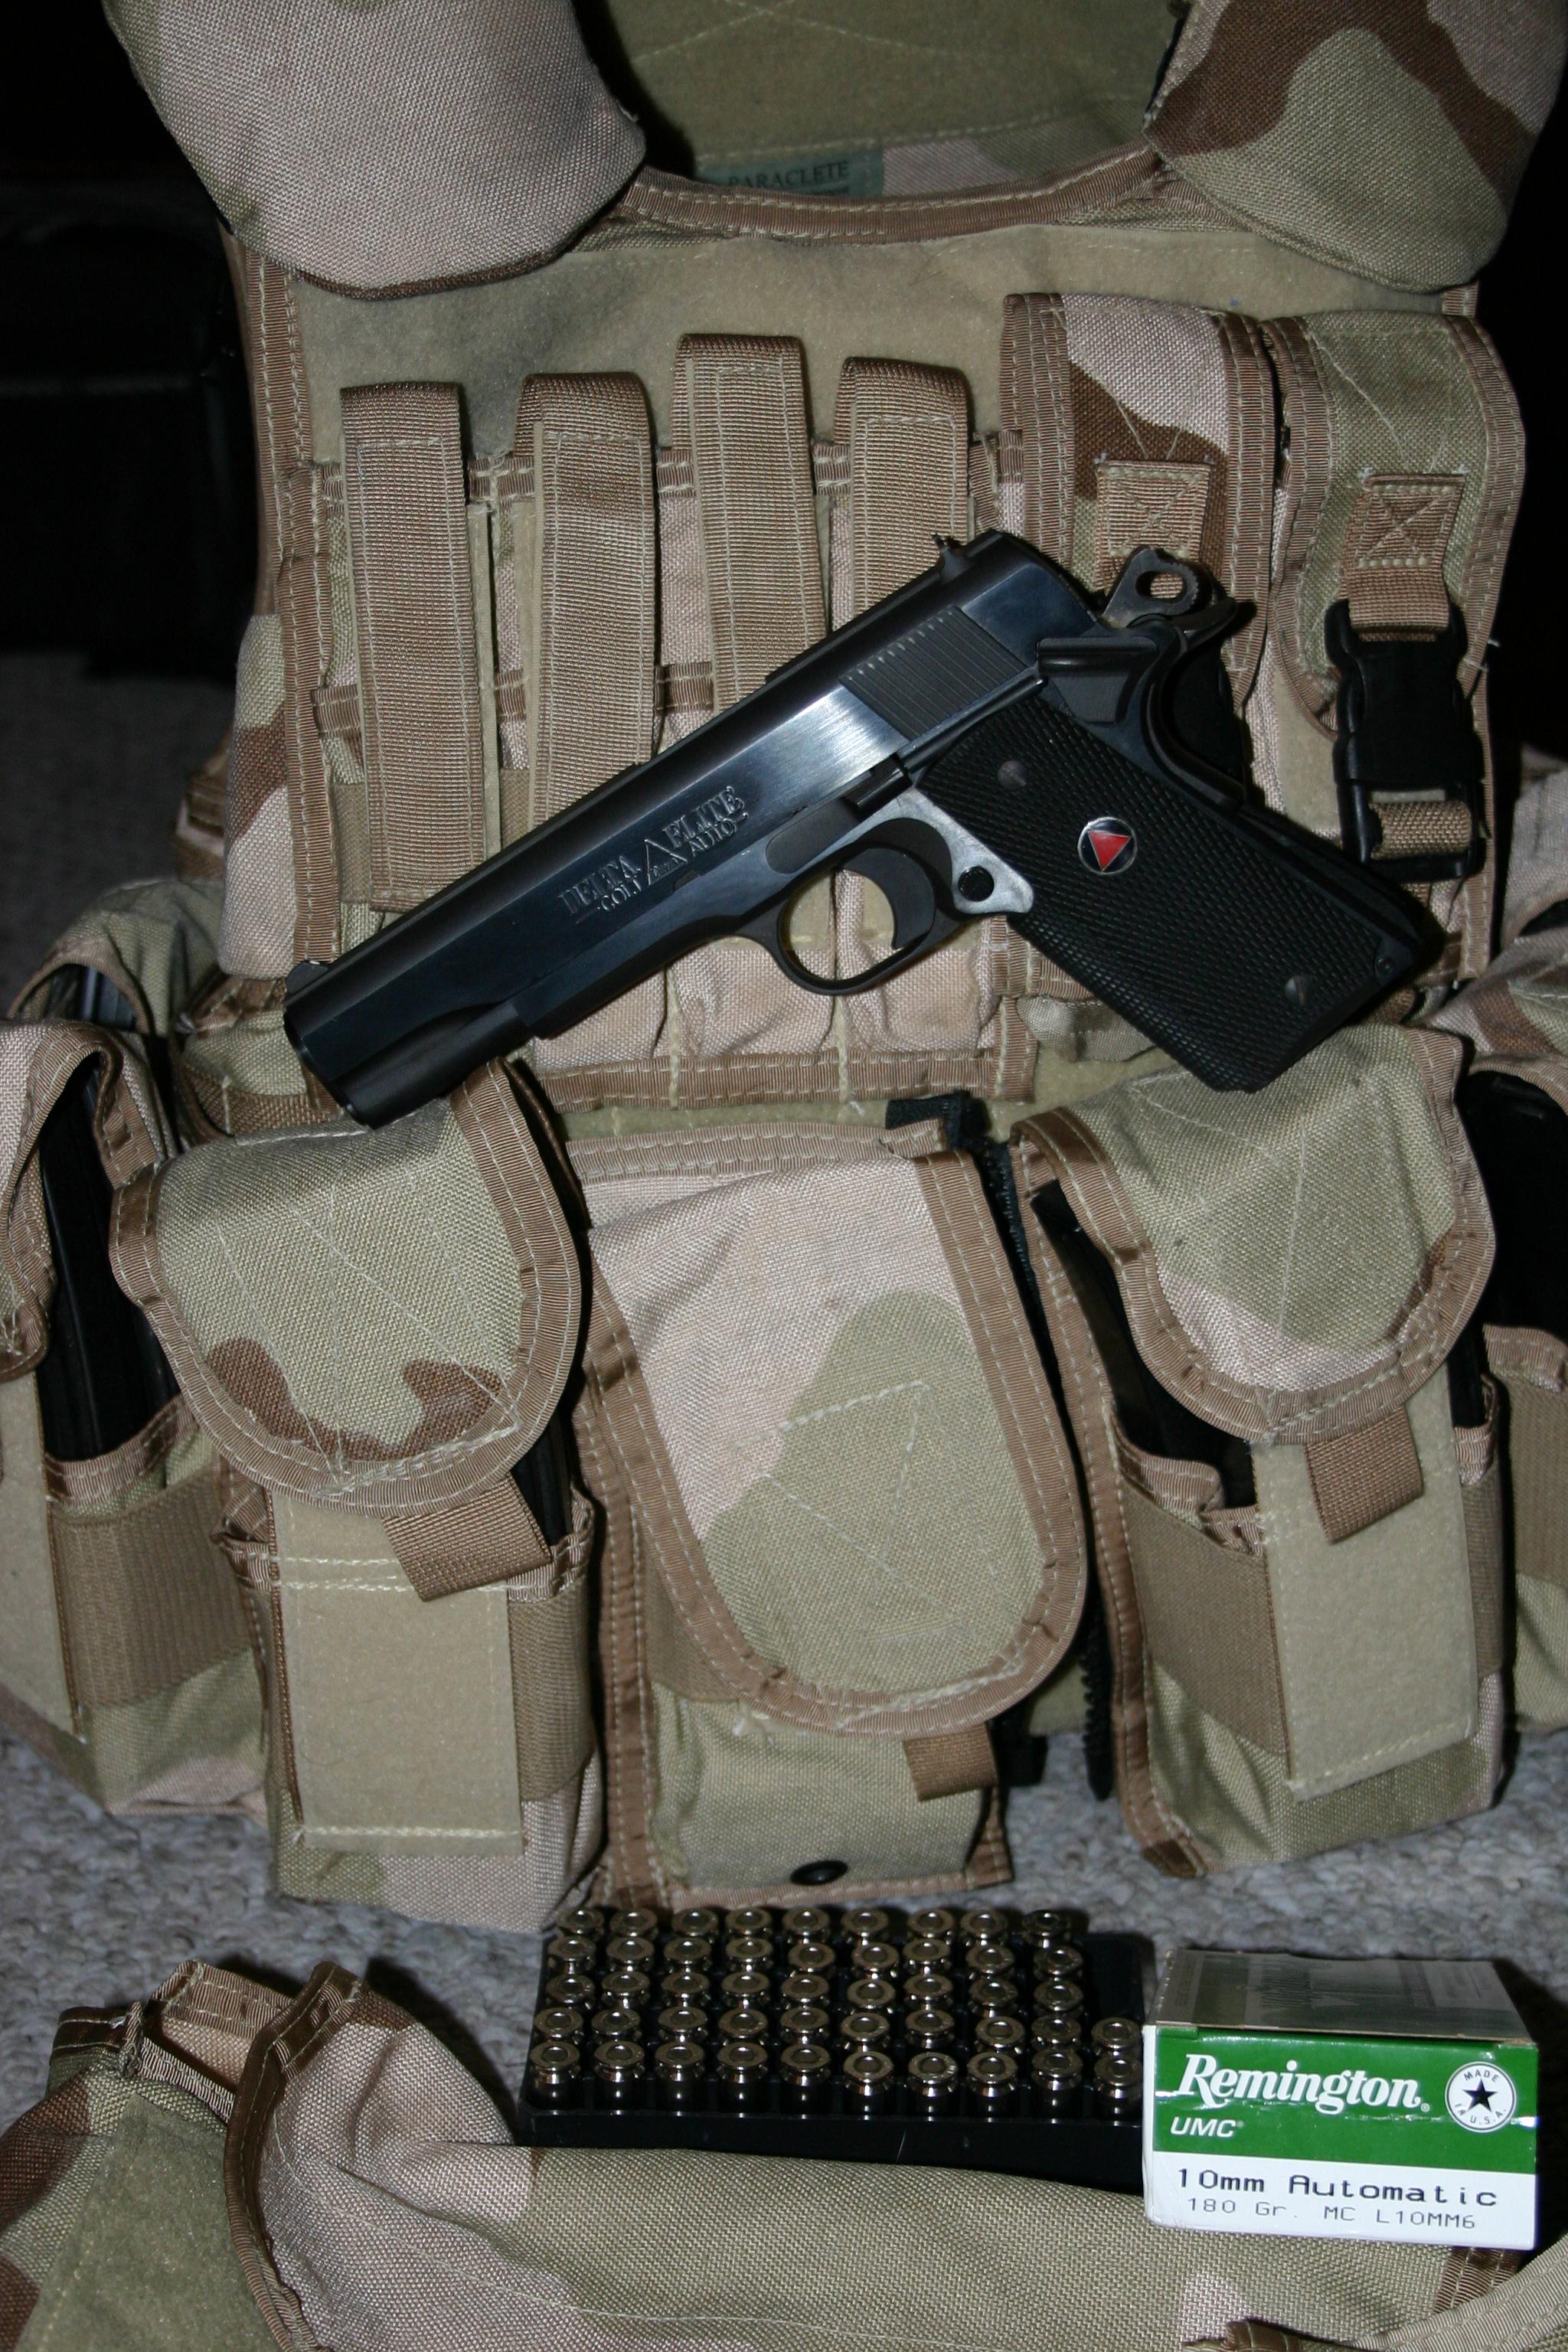 File:Colt 10mm Auto Delta Elite jpg - Wikimedia Commons